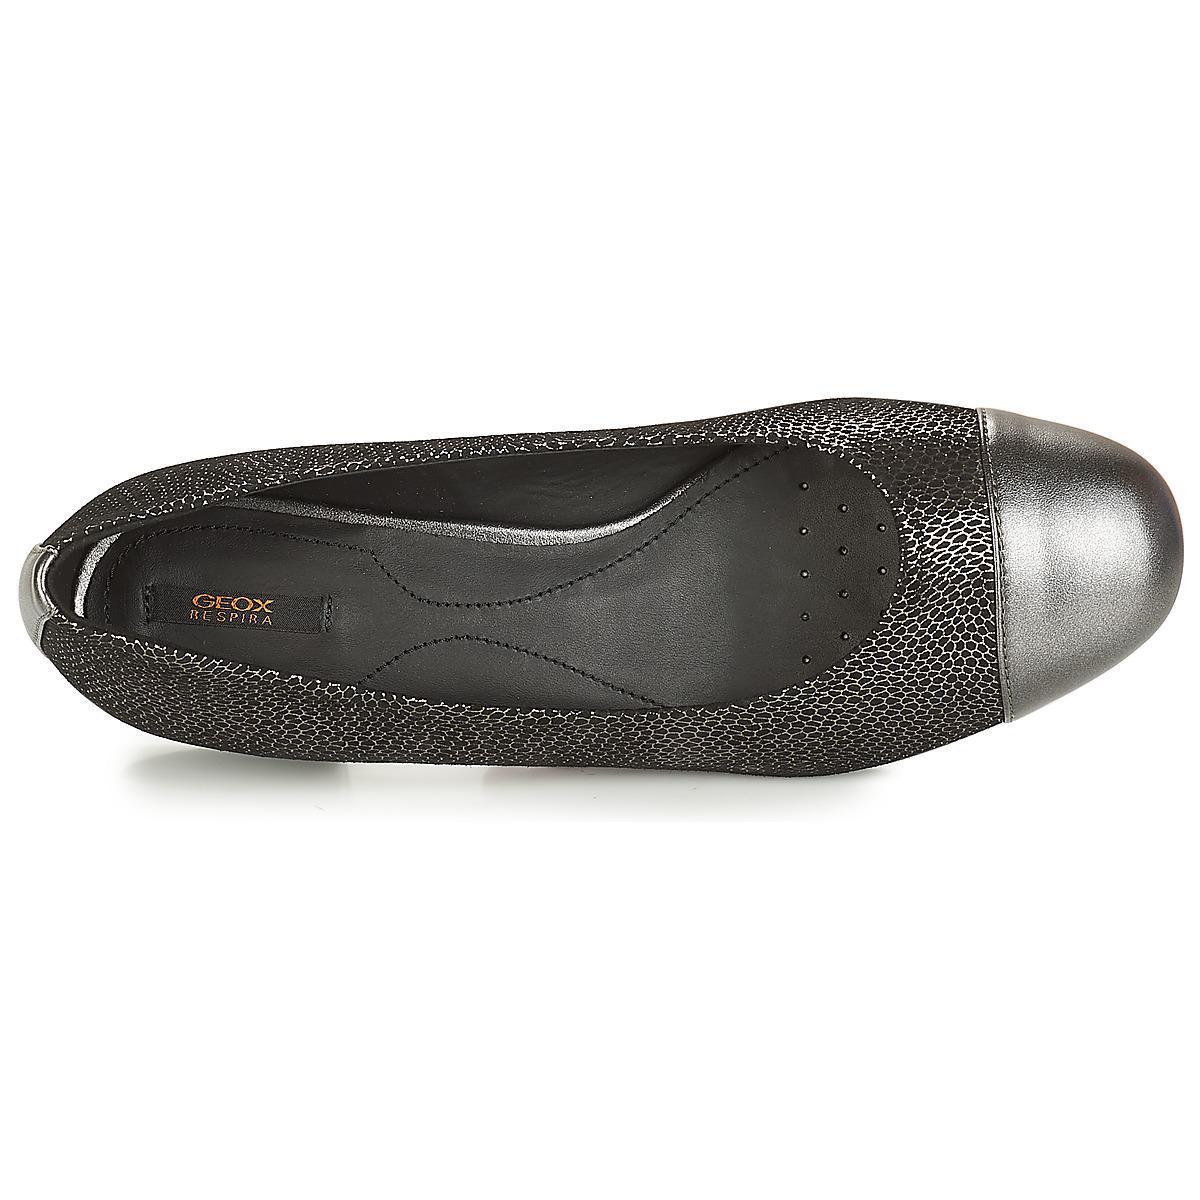 Geox Womens Annytah 1 Suede Bit Loafer Flat